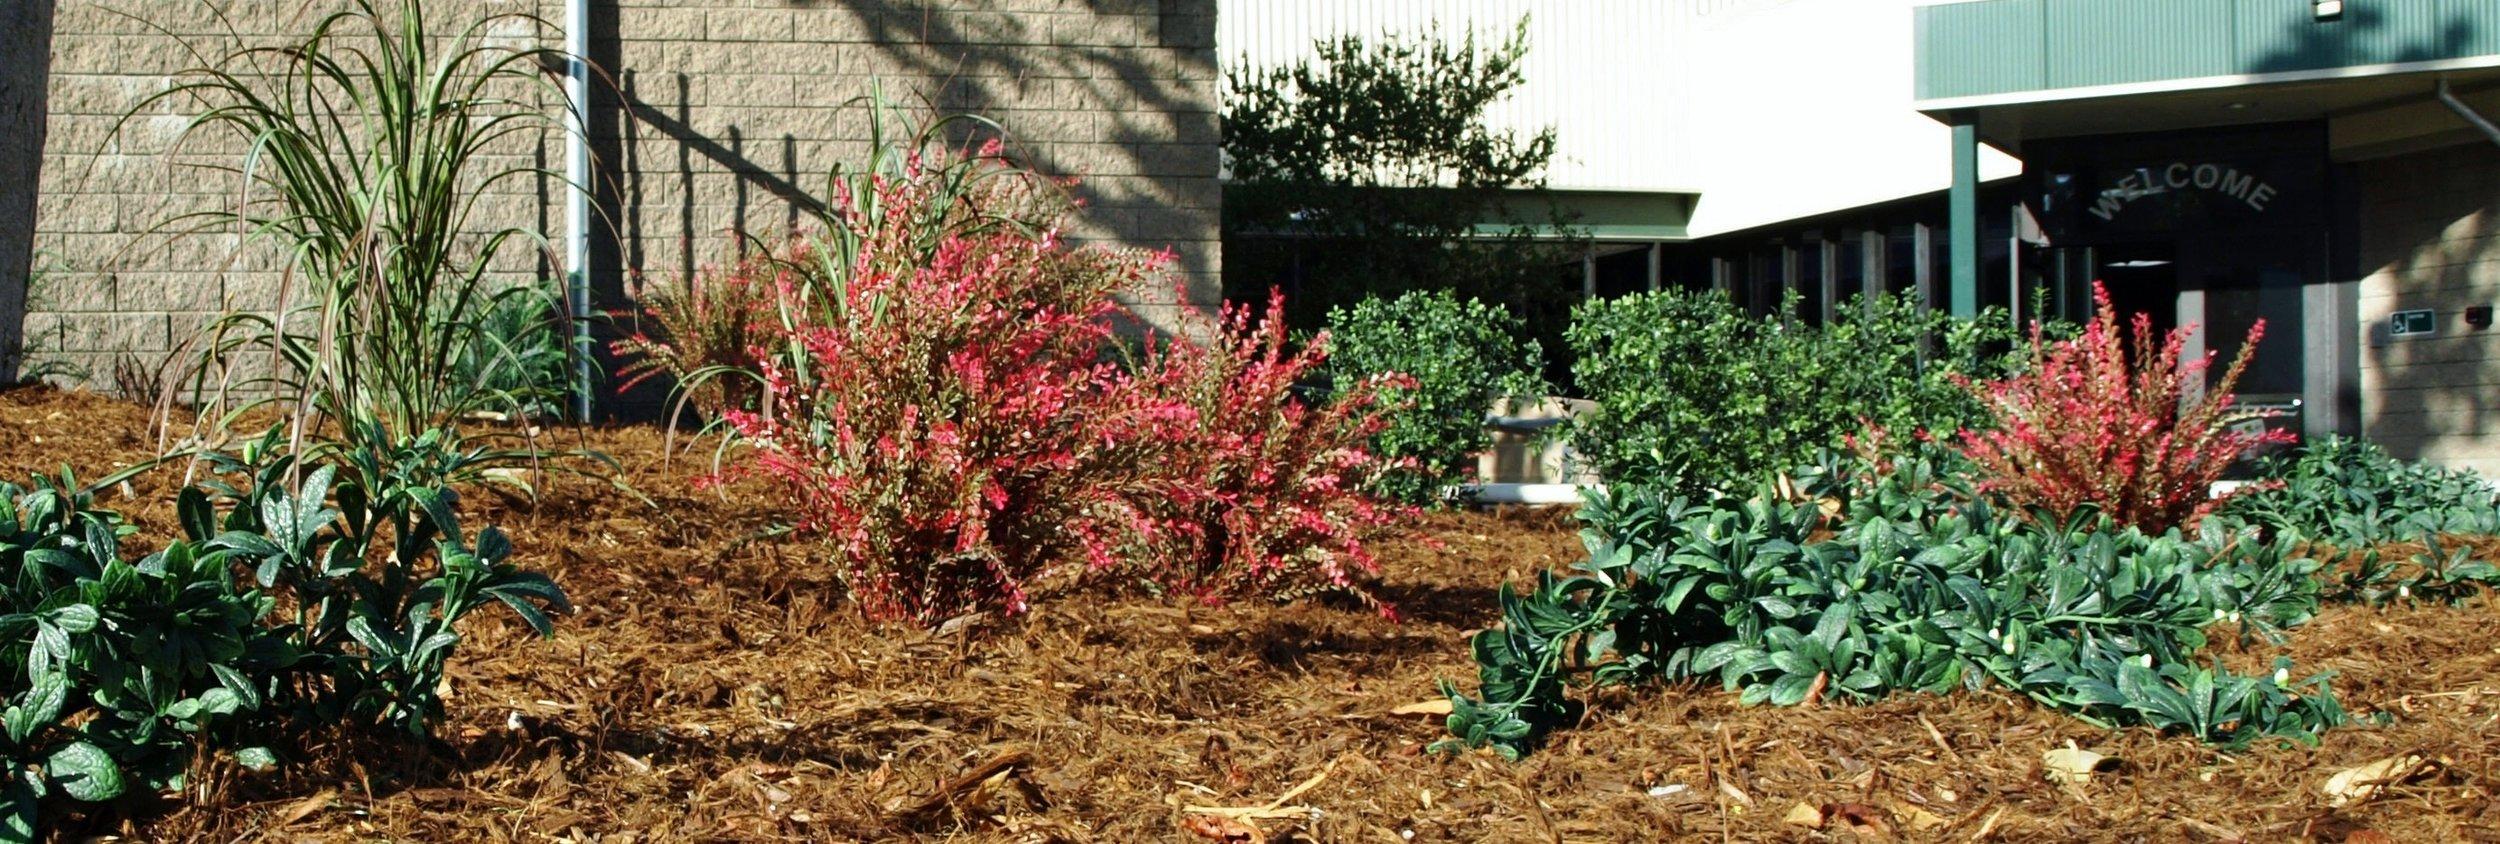 Panorama plants.jpg